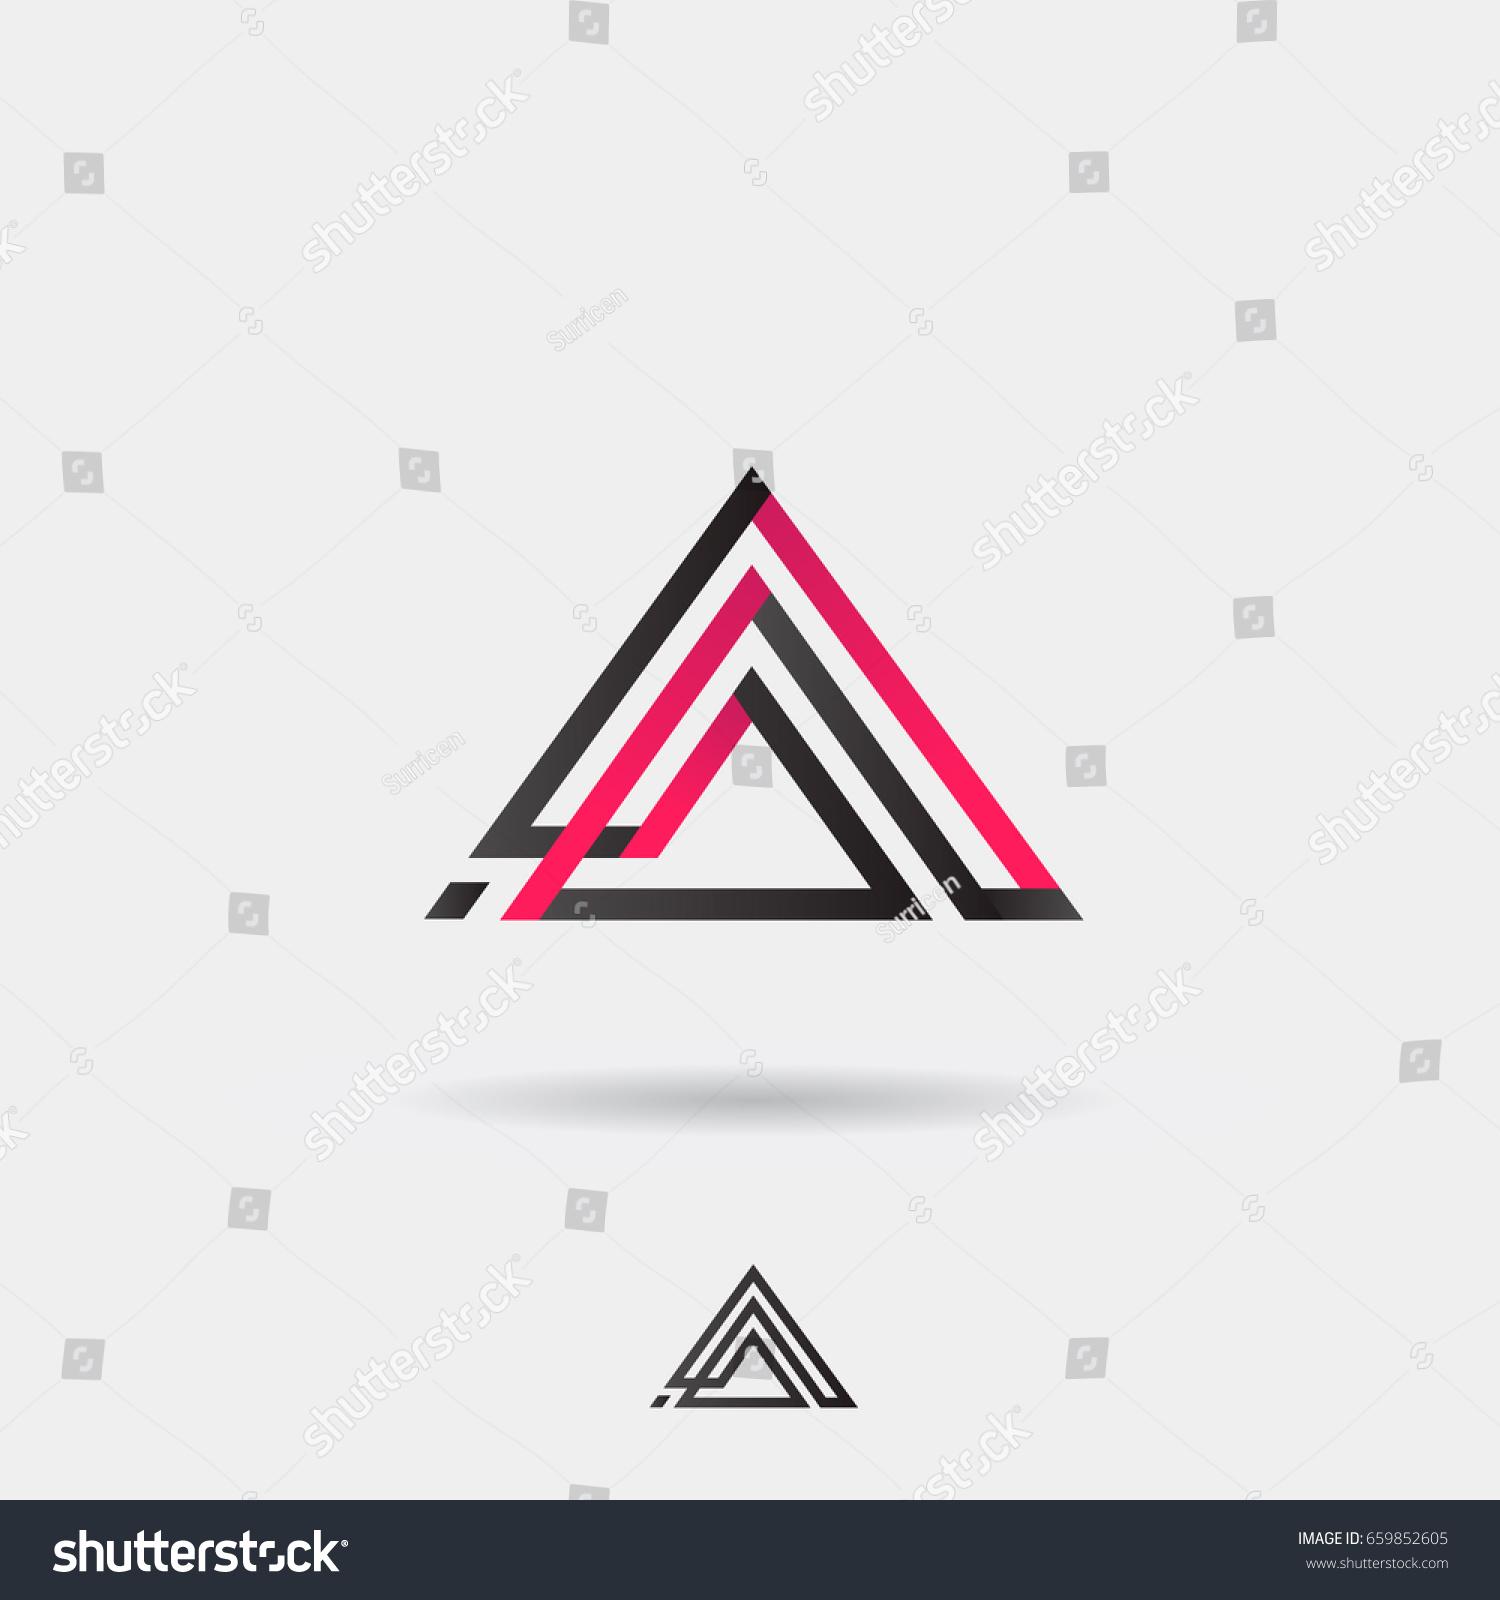 Creative Modern Pyramid Logo Triangle Shape Stock Vector 659852605 ...